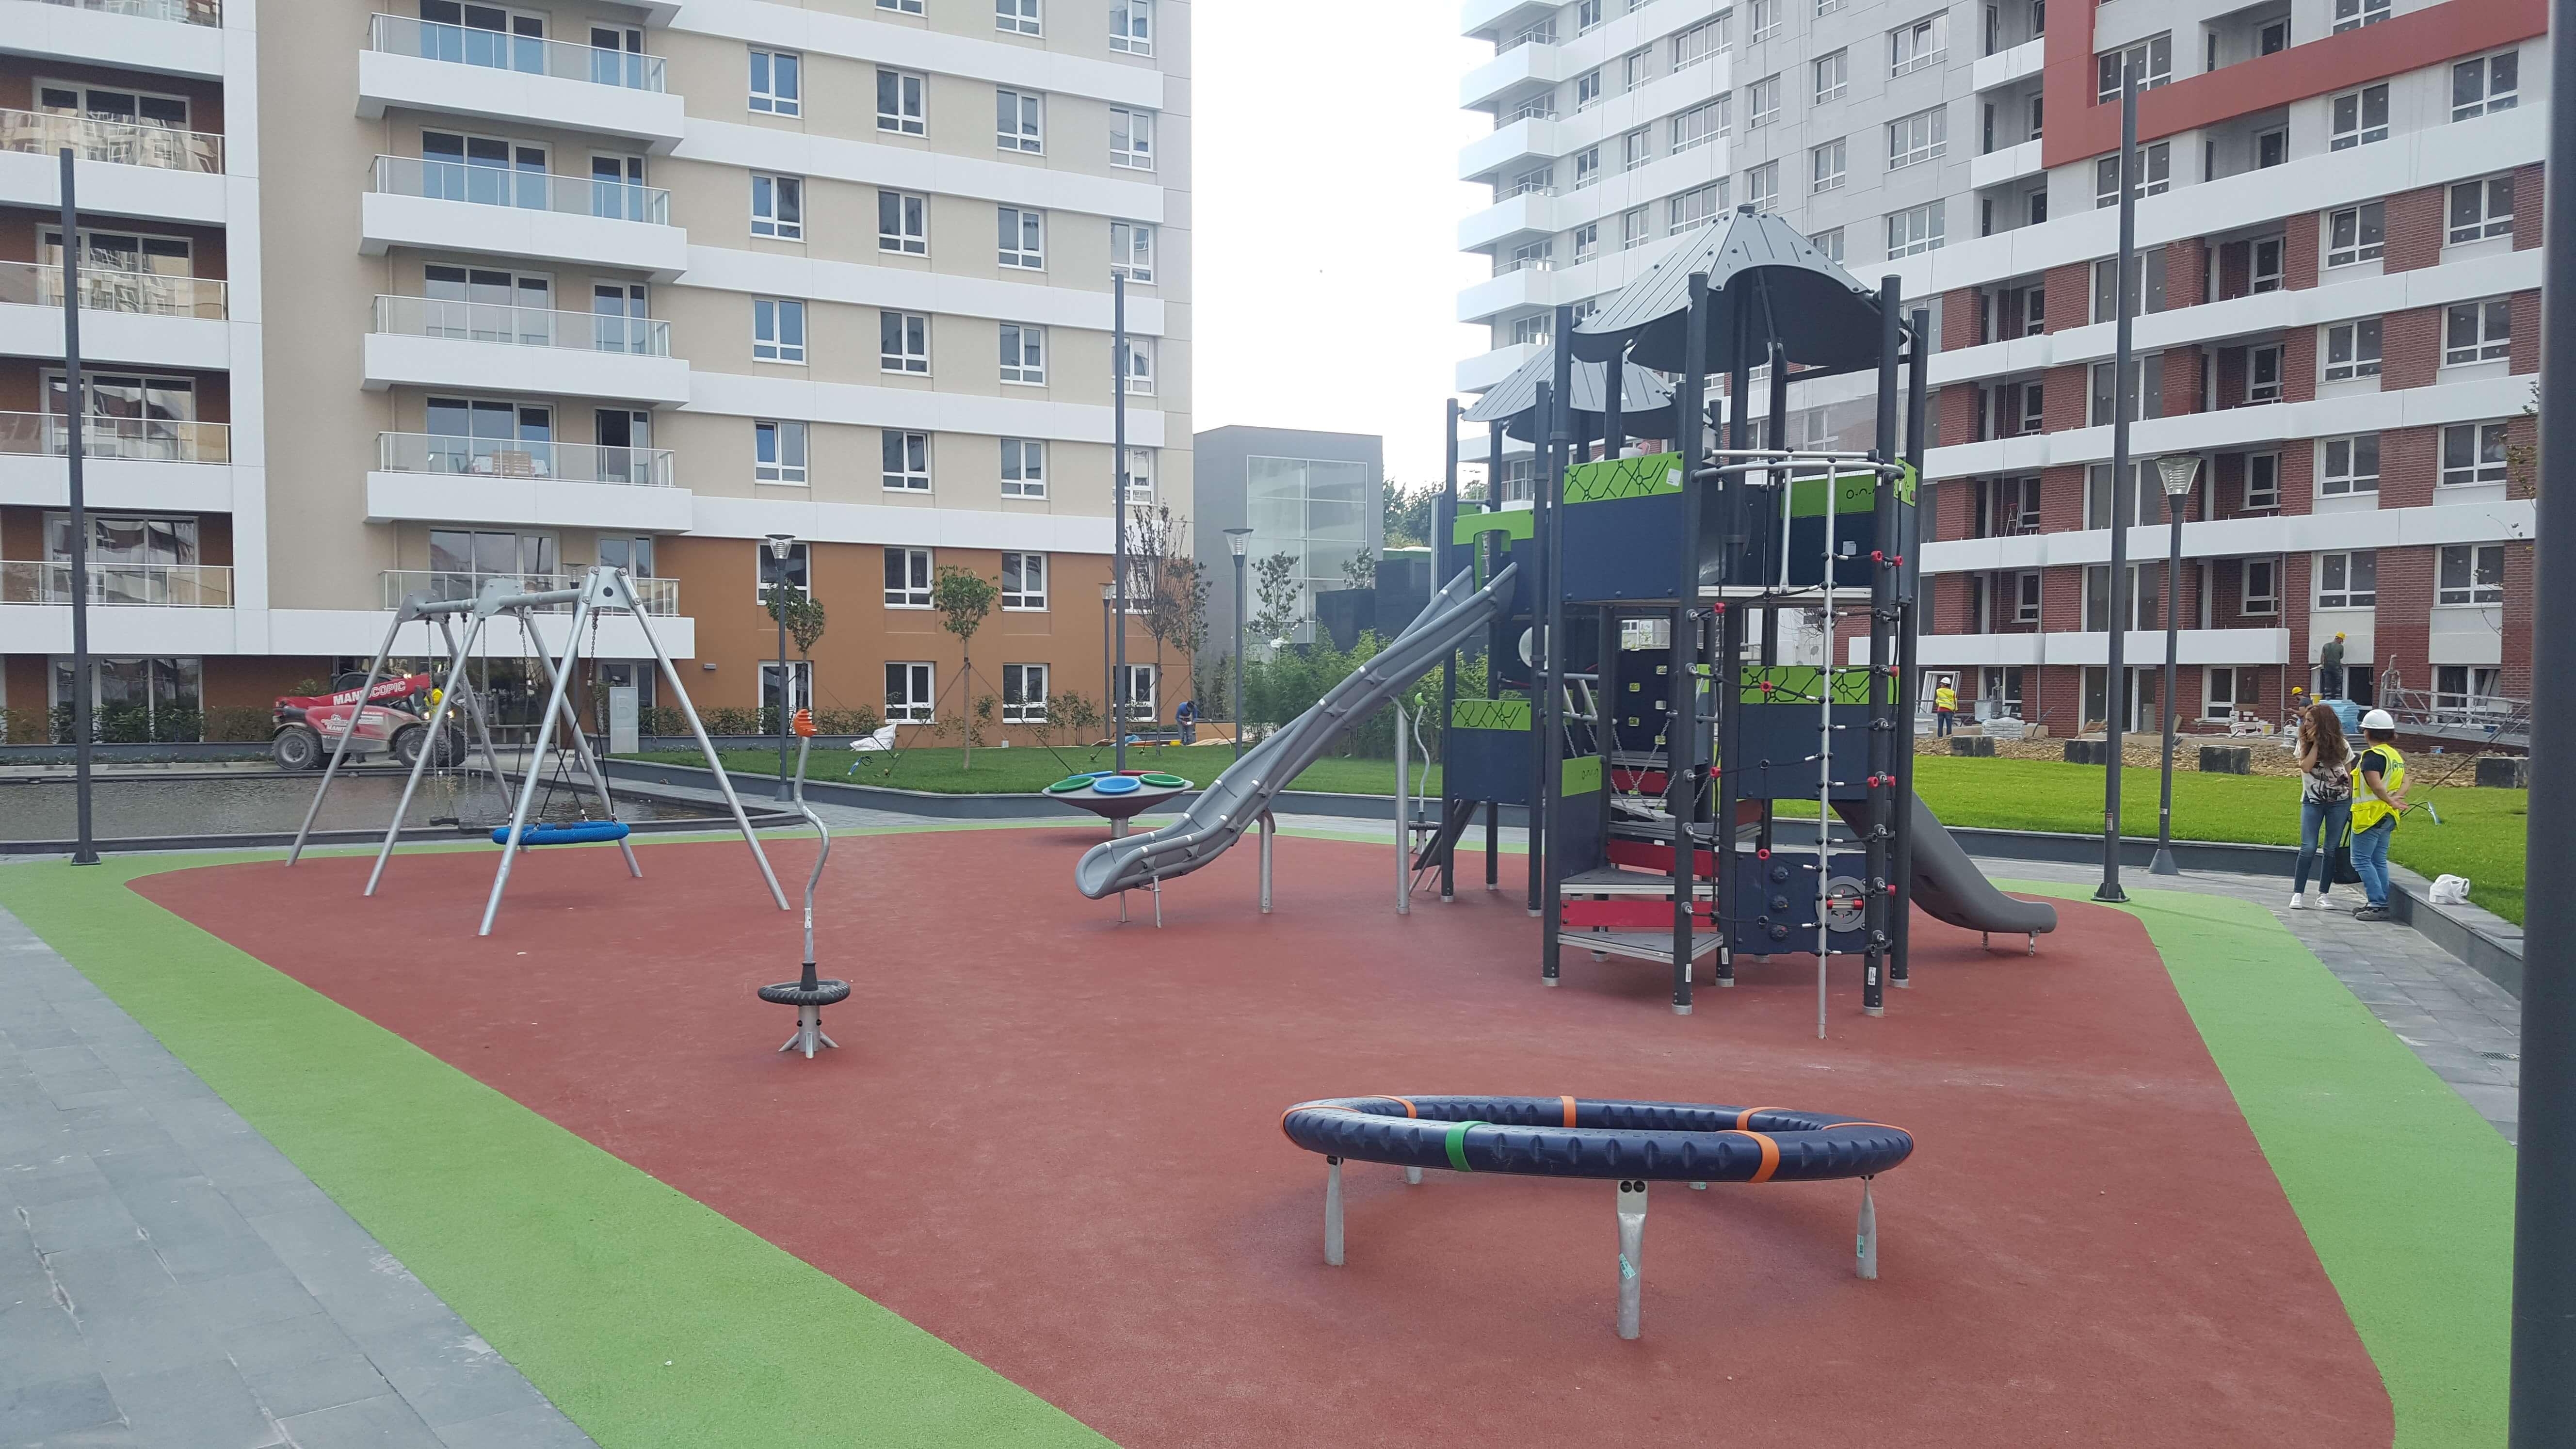 Nurol Park İstanbul Çocuk Parkı 3